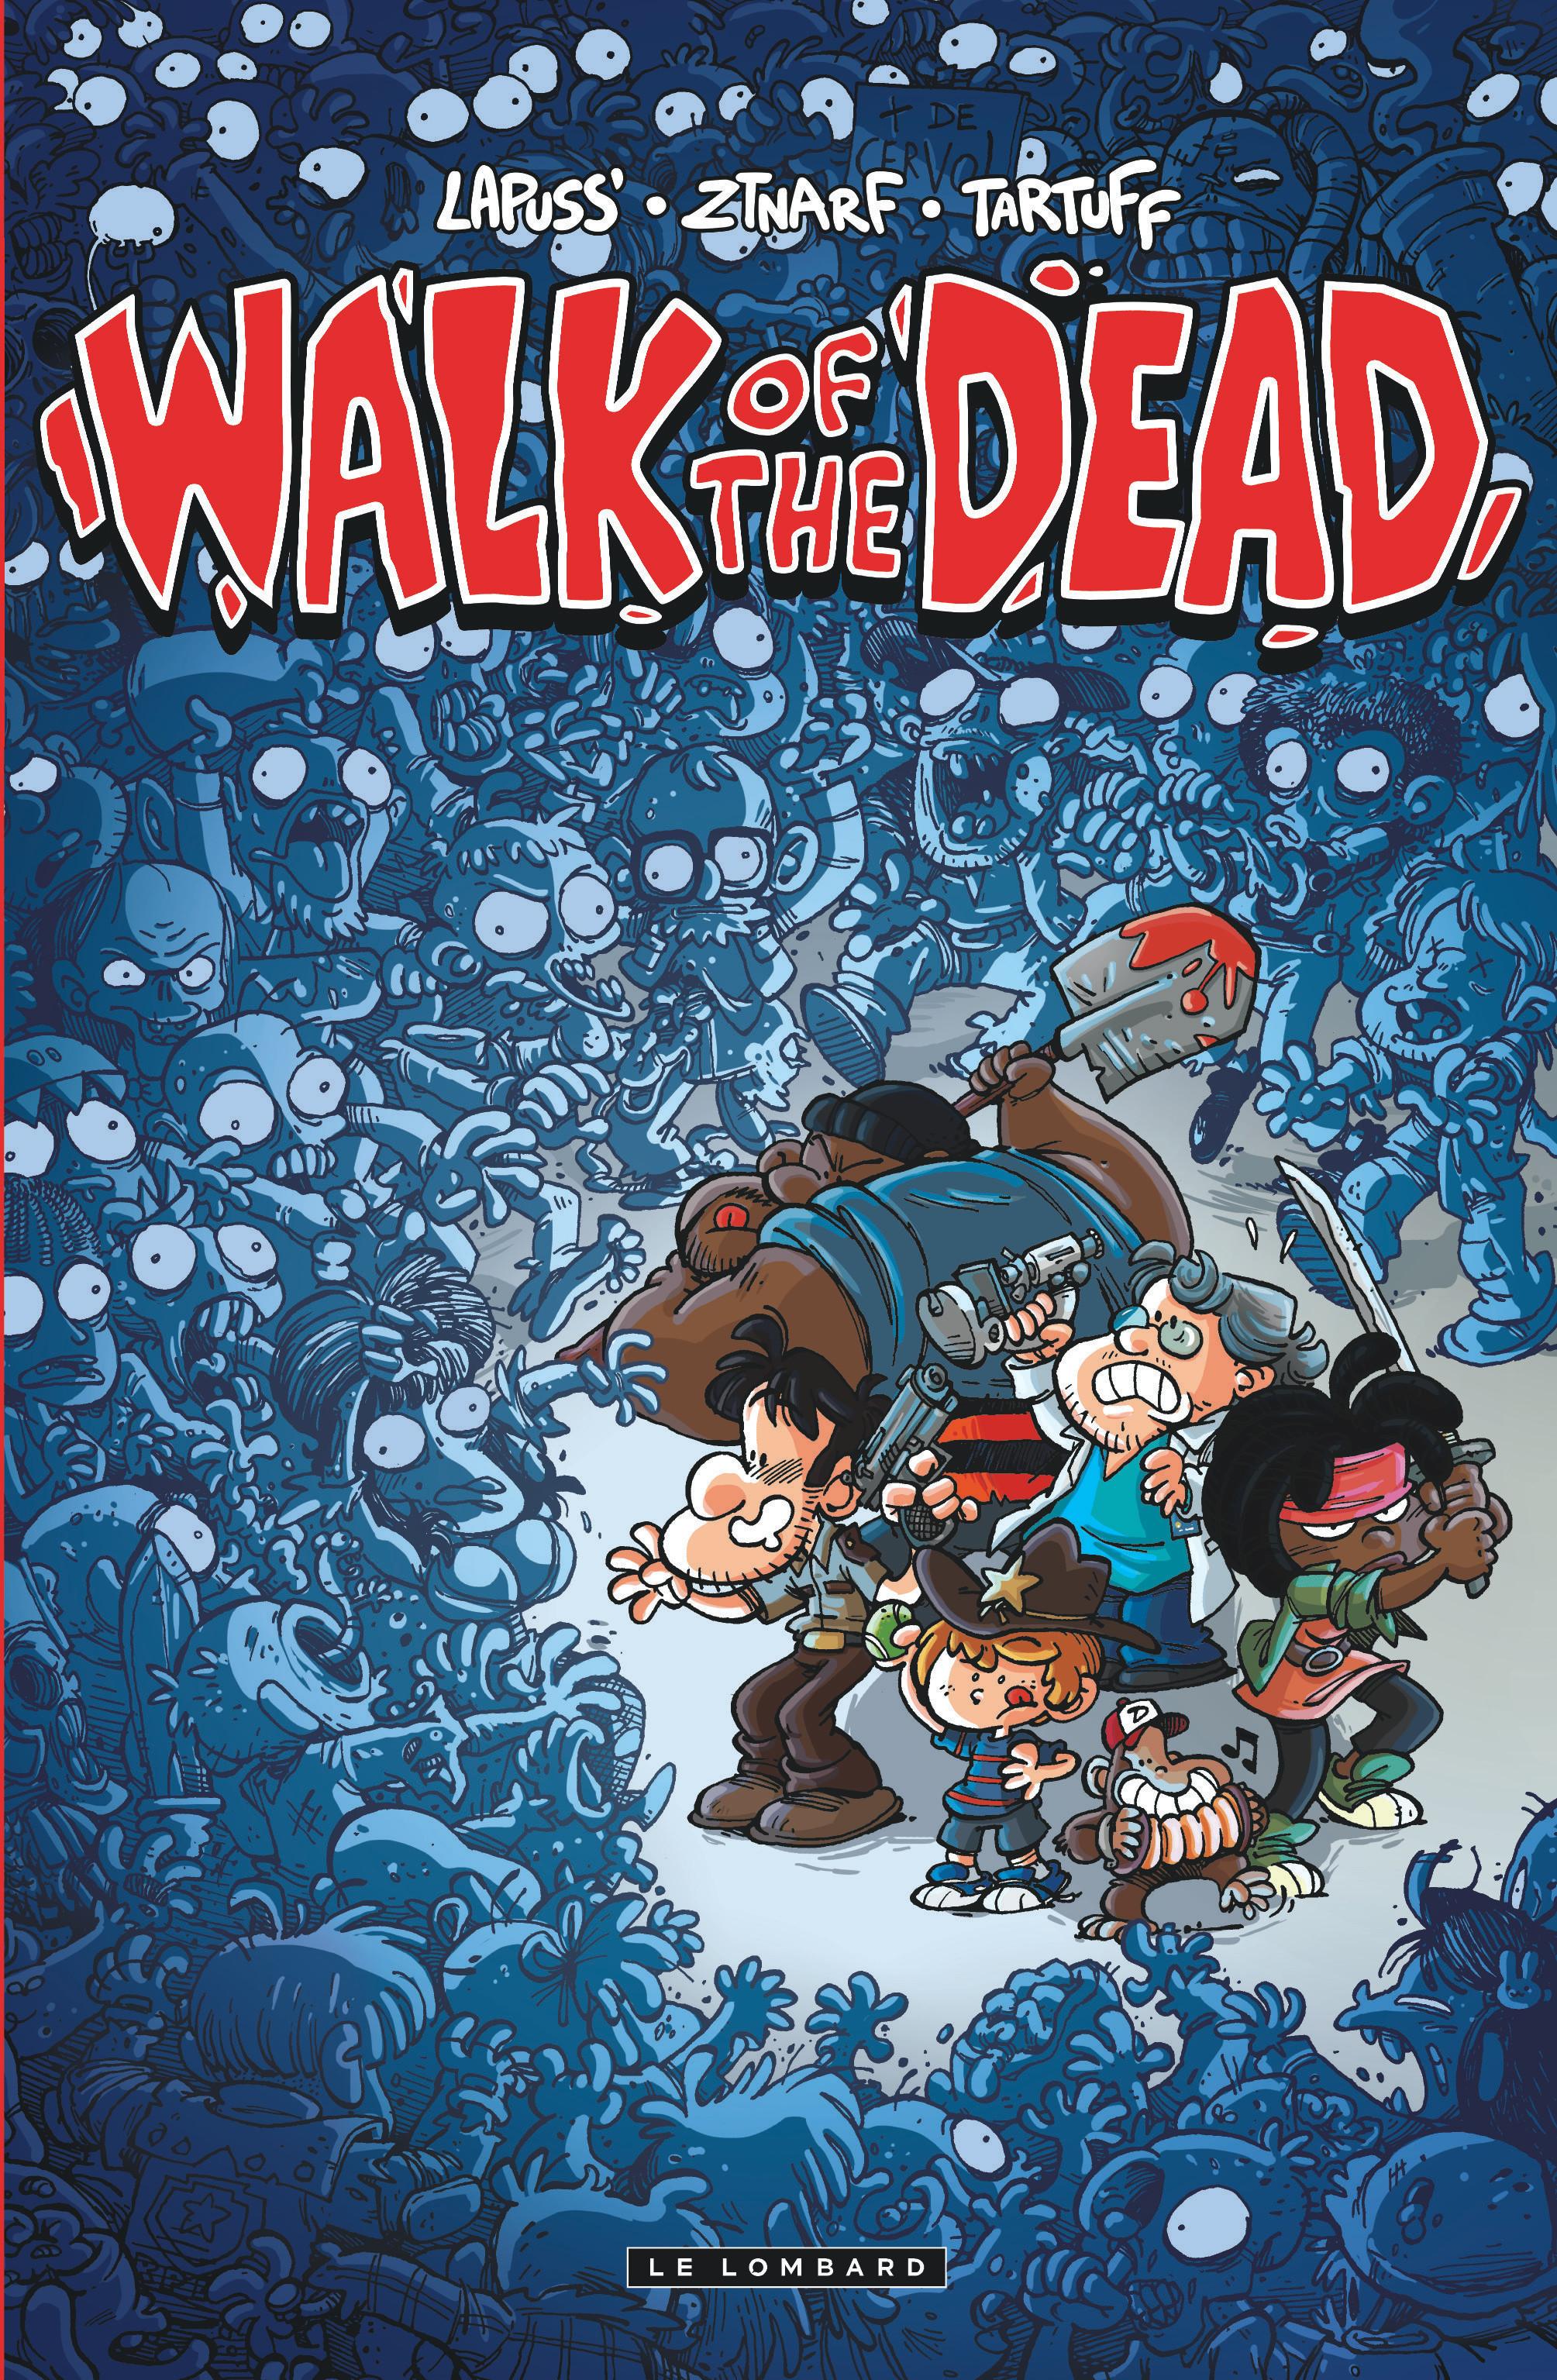 WALK OF THE DEAD WALK OF THE DEAD